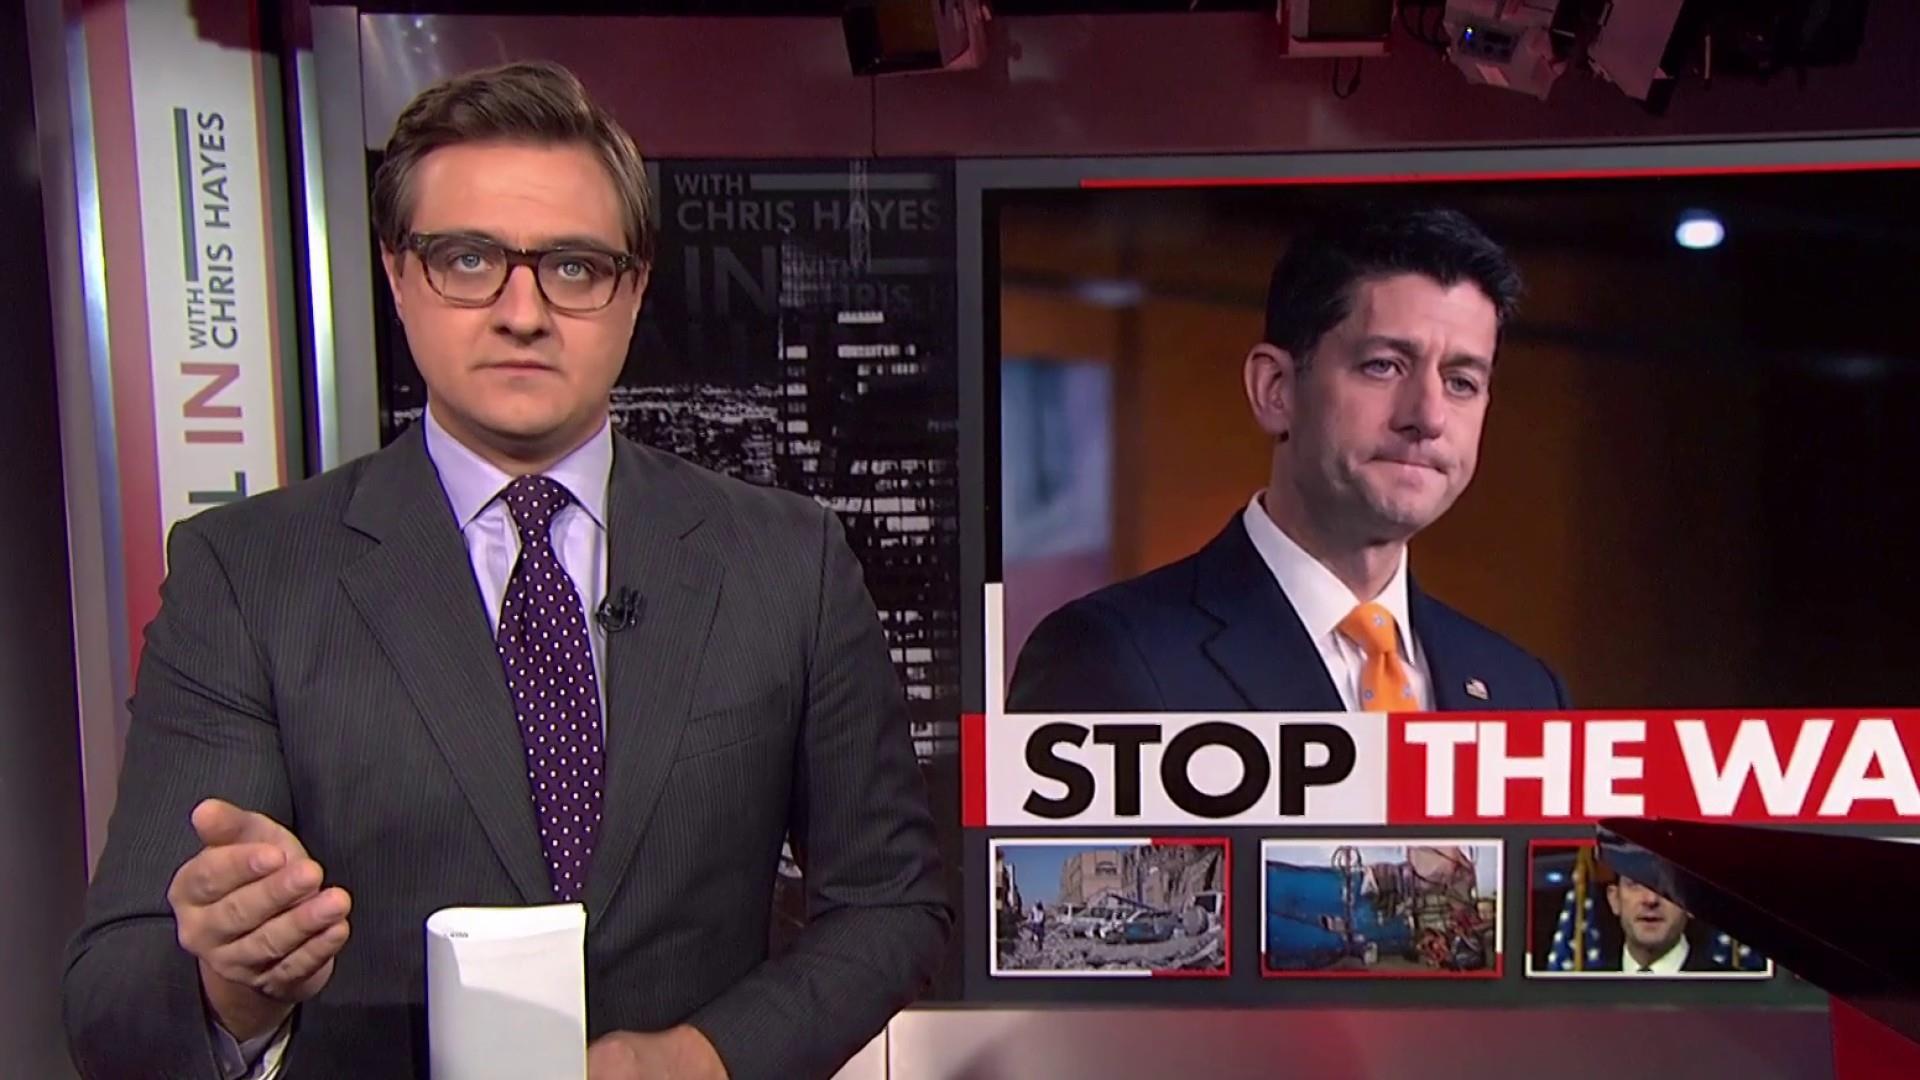 Paul Ryan's cowardly act on Yemen